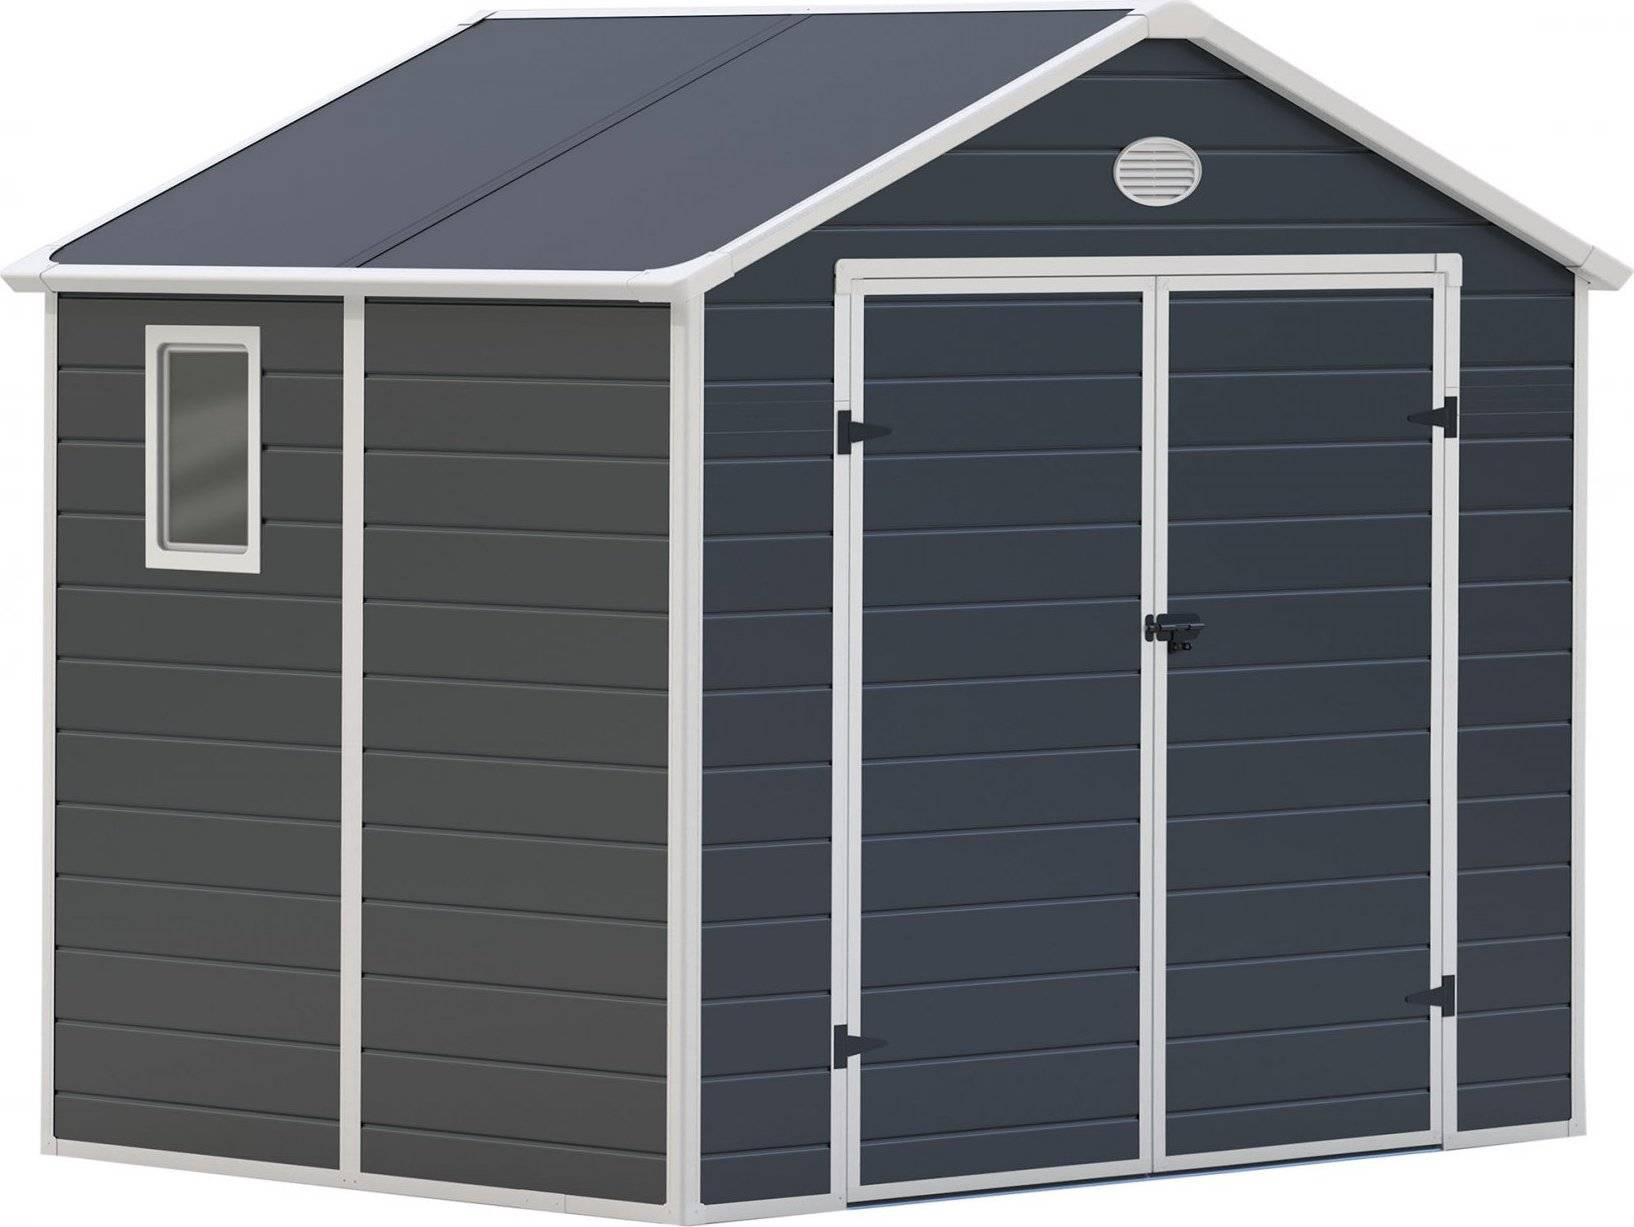 Zahradní domek PAH 458 - 241 x 190 cm, plastový, šedý 6390038 G21